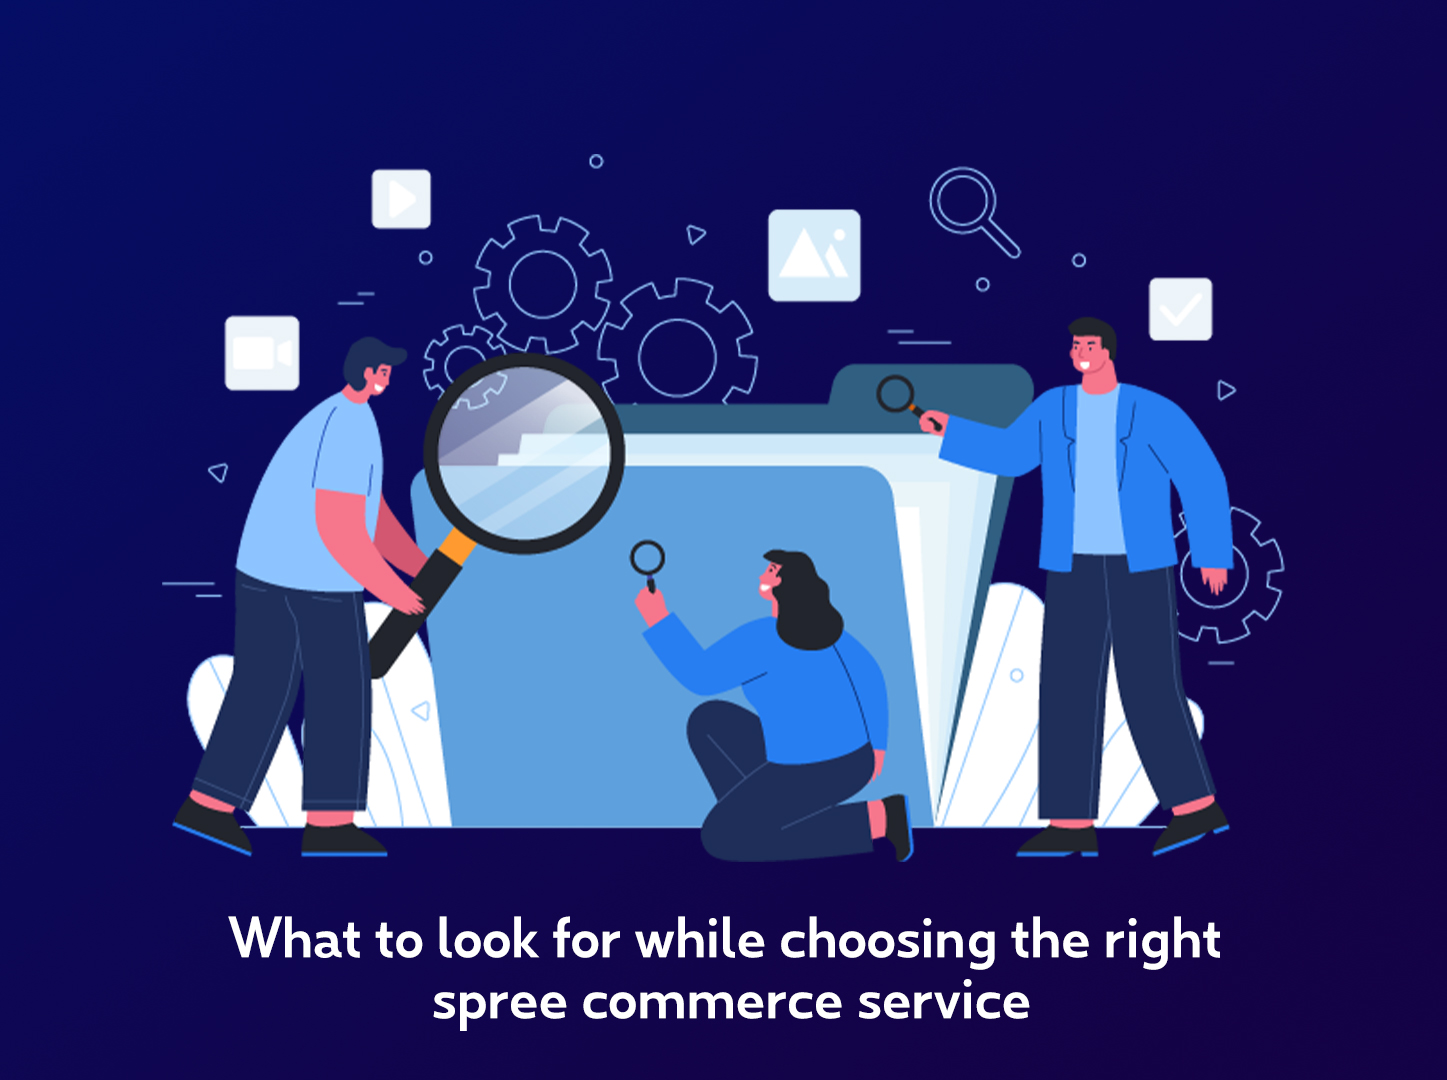 Spree commerce service